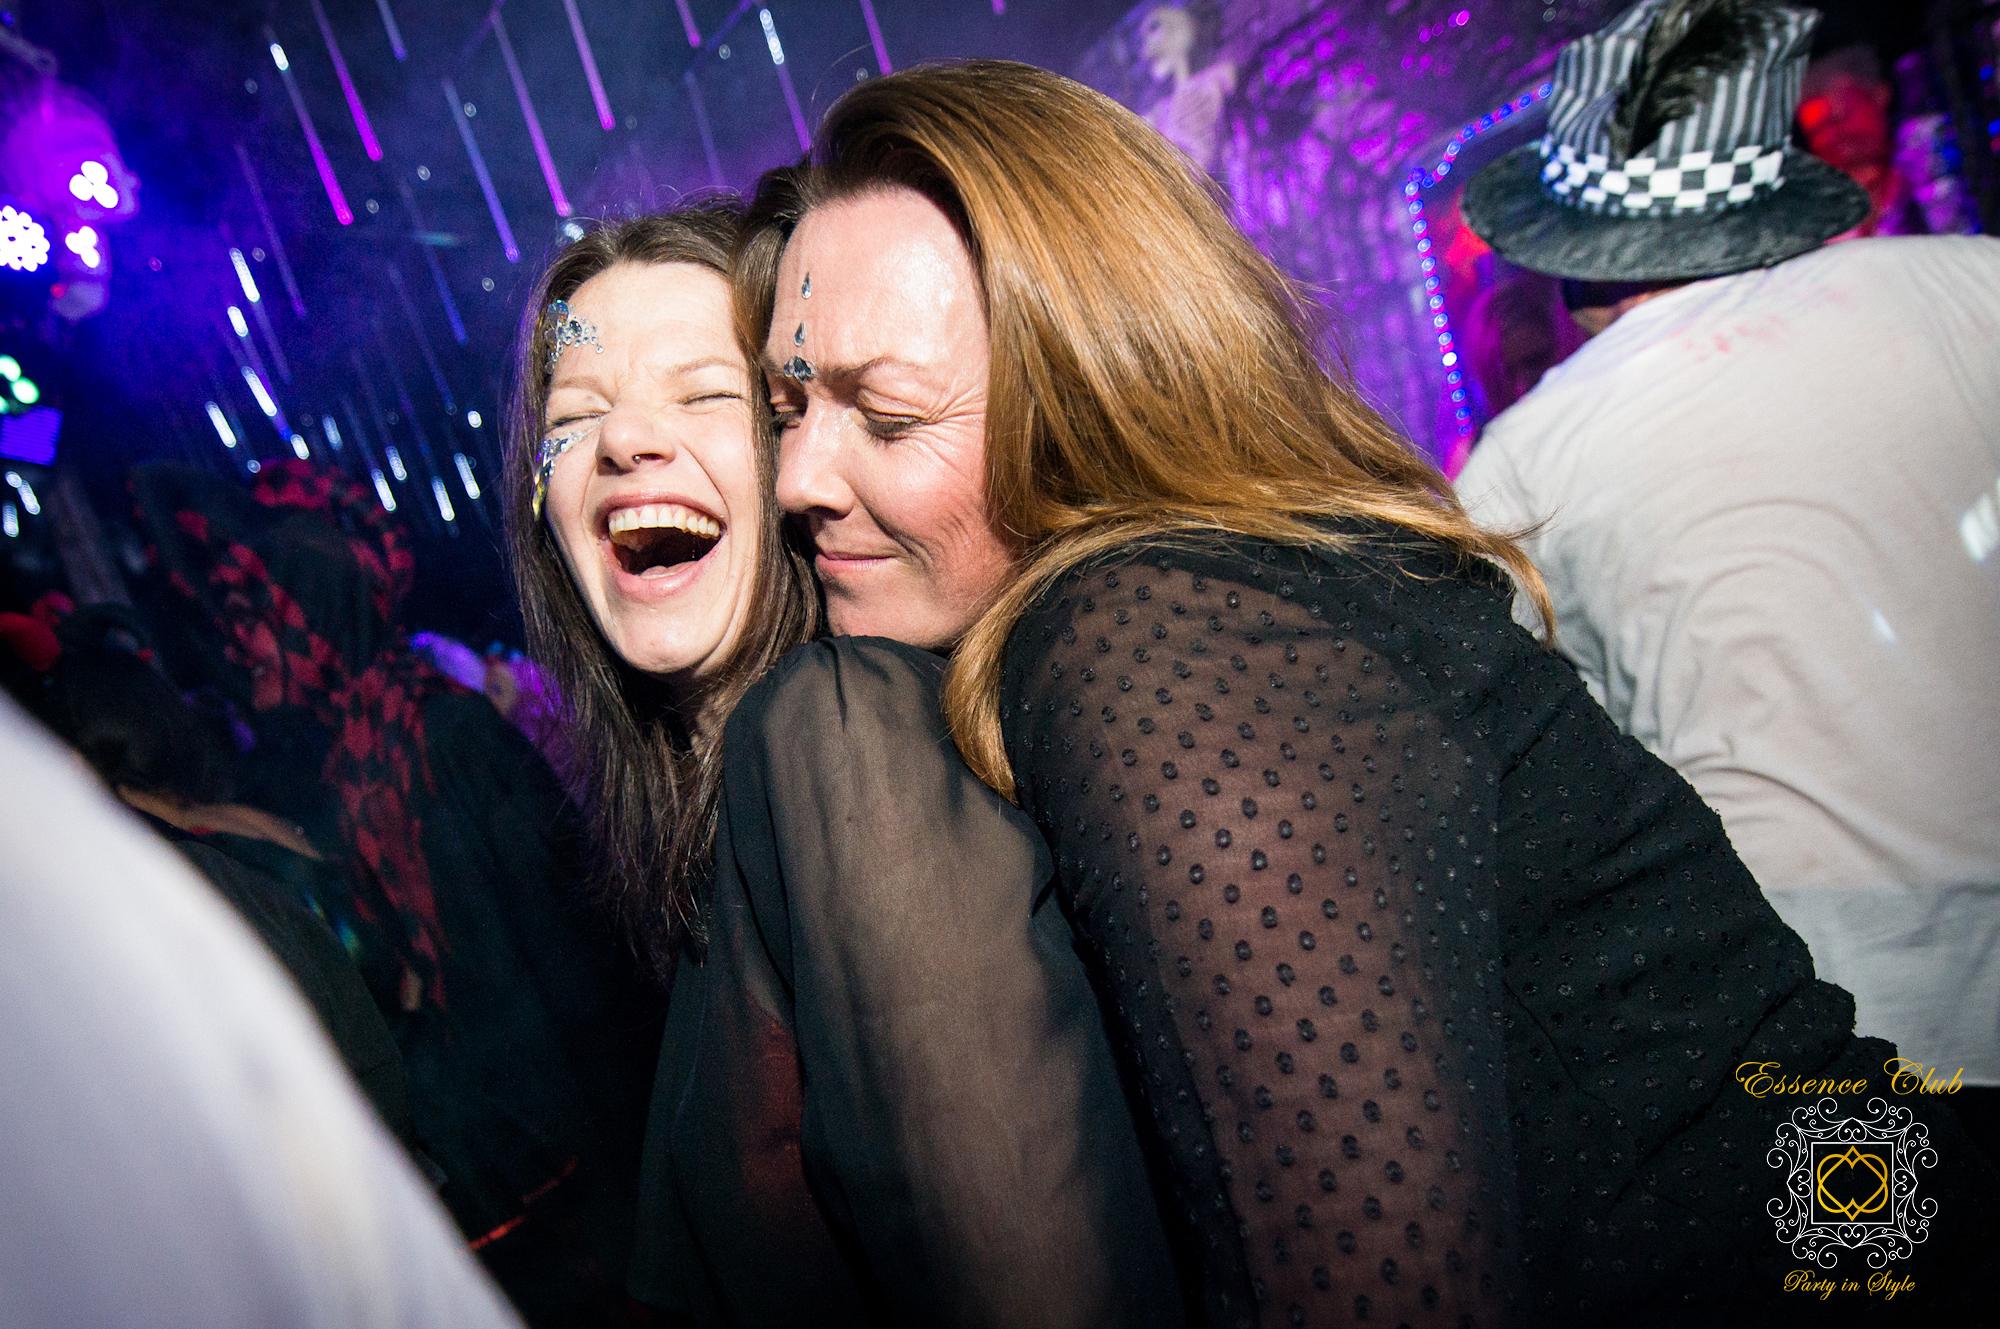 Essence Club love parties